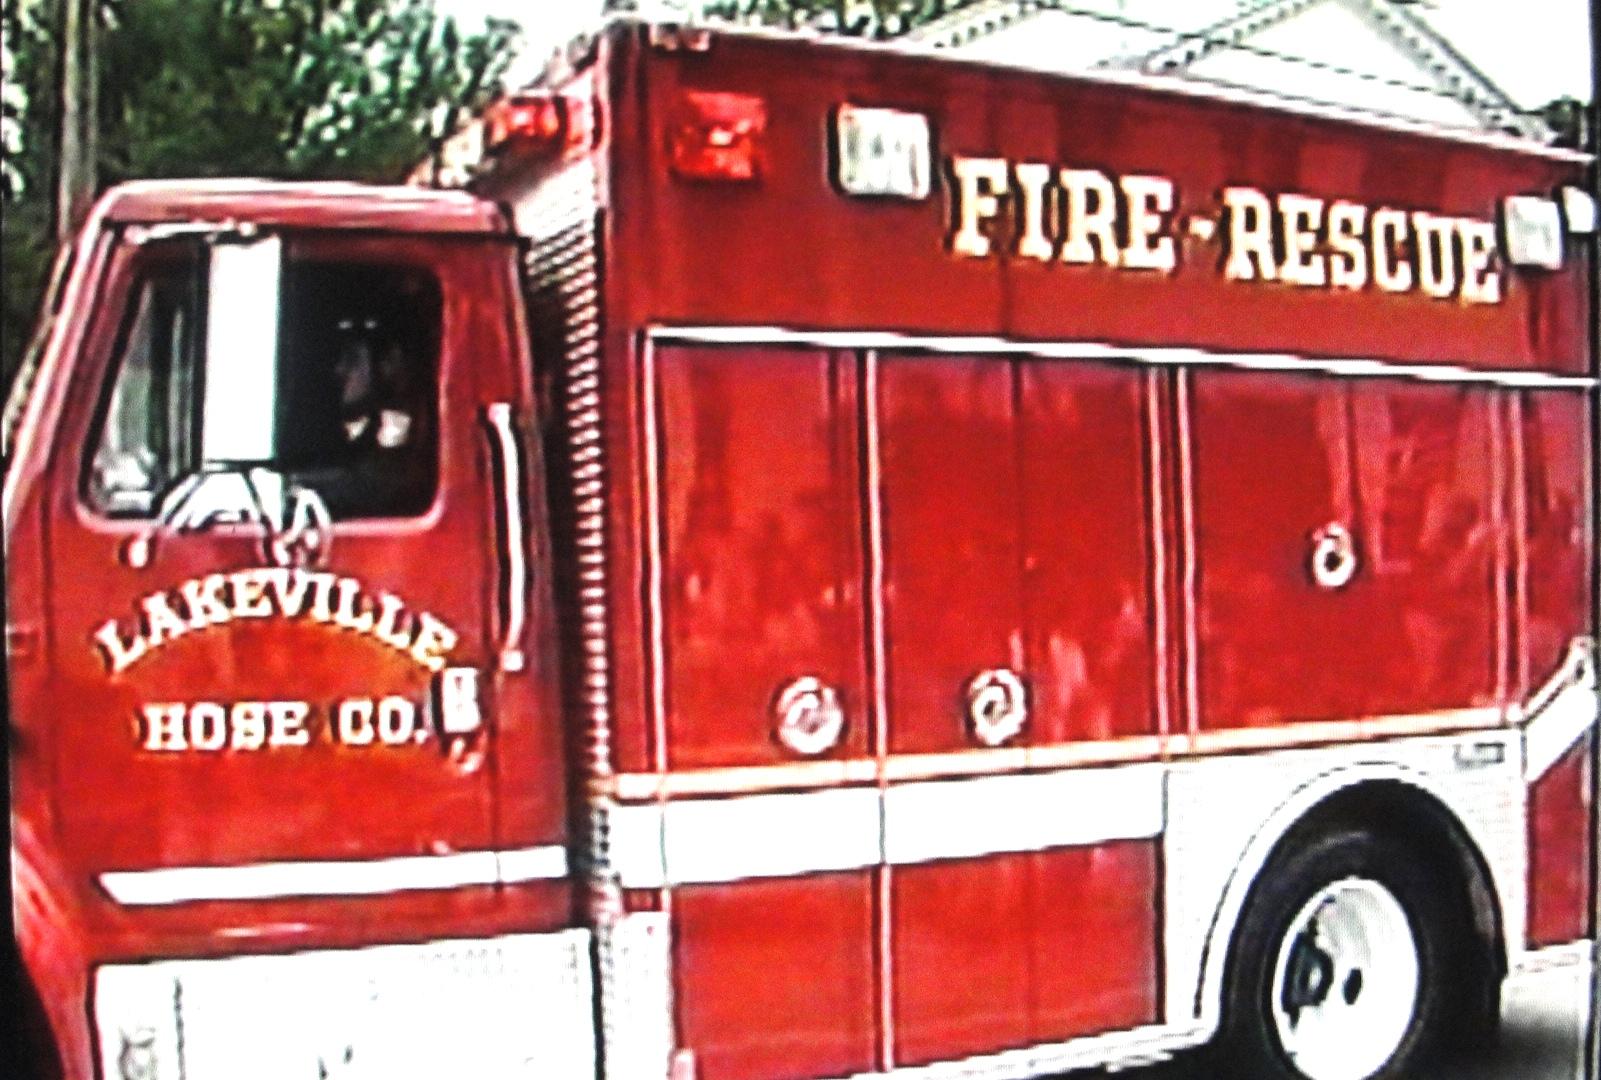 lakeville fire truck 2002